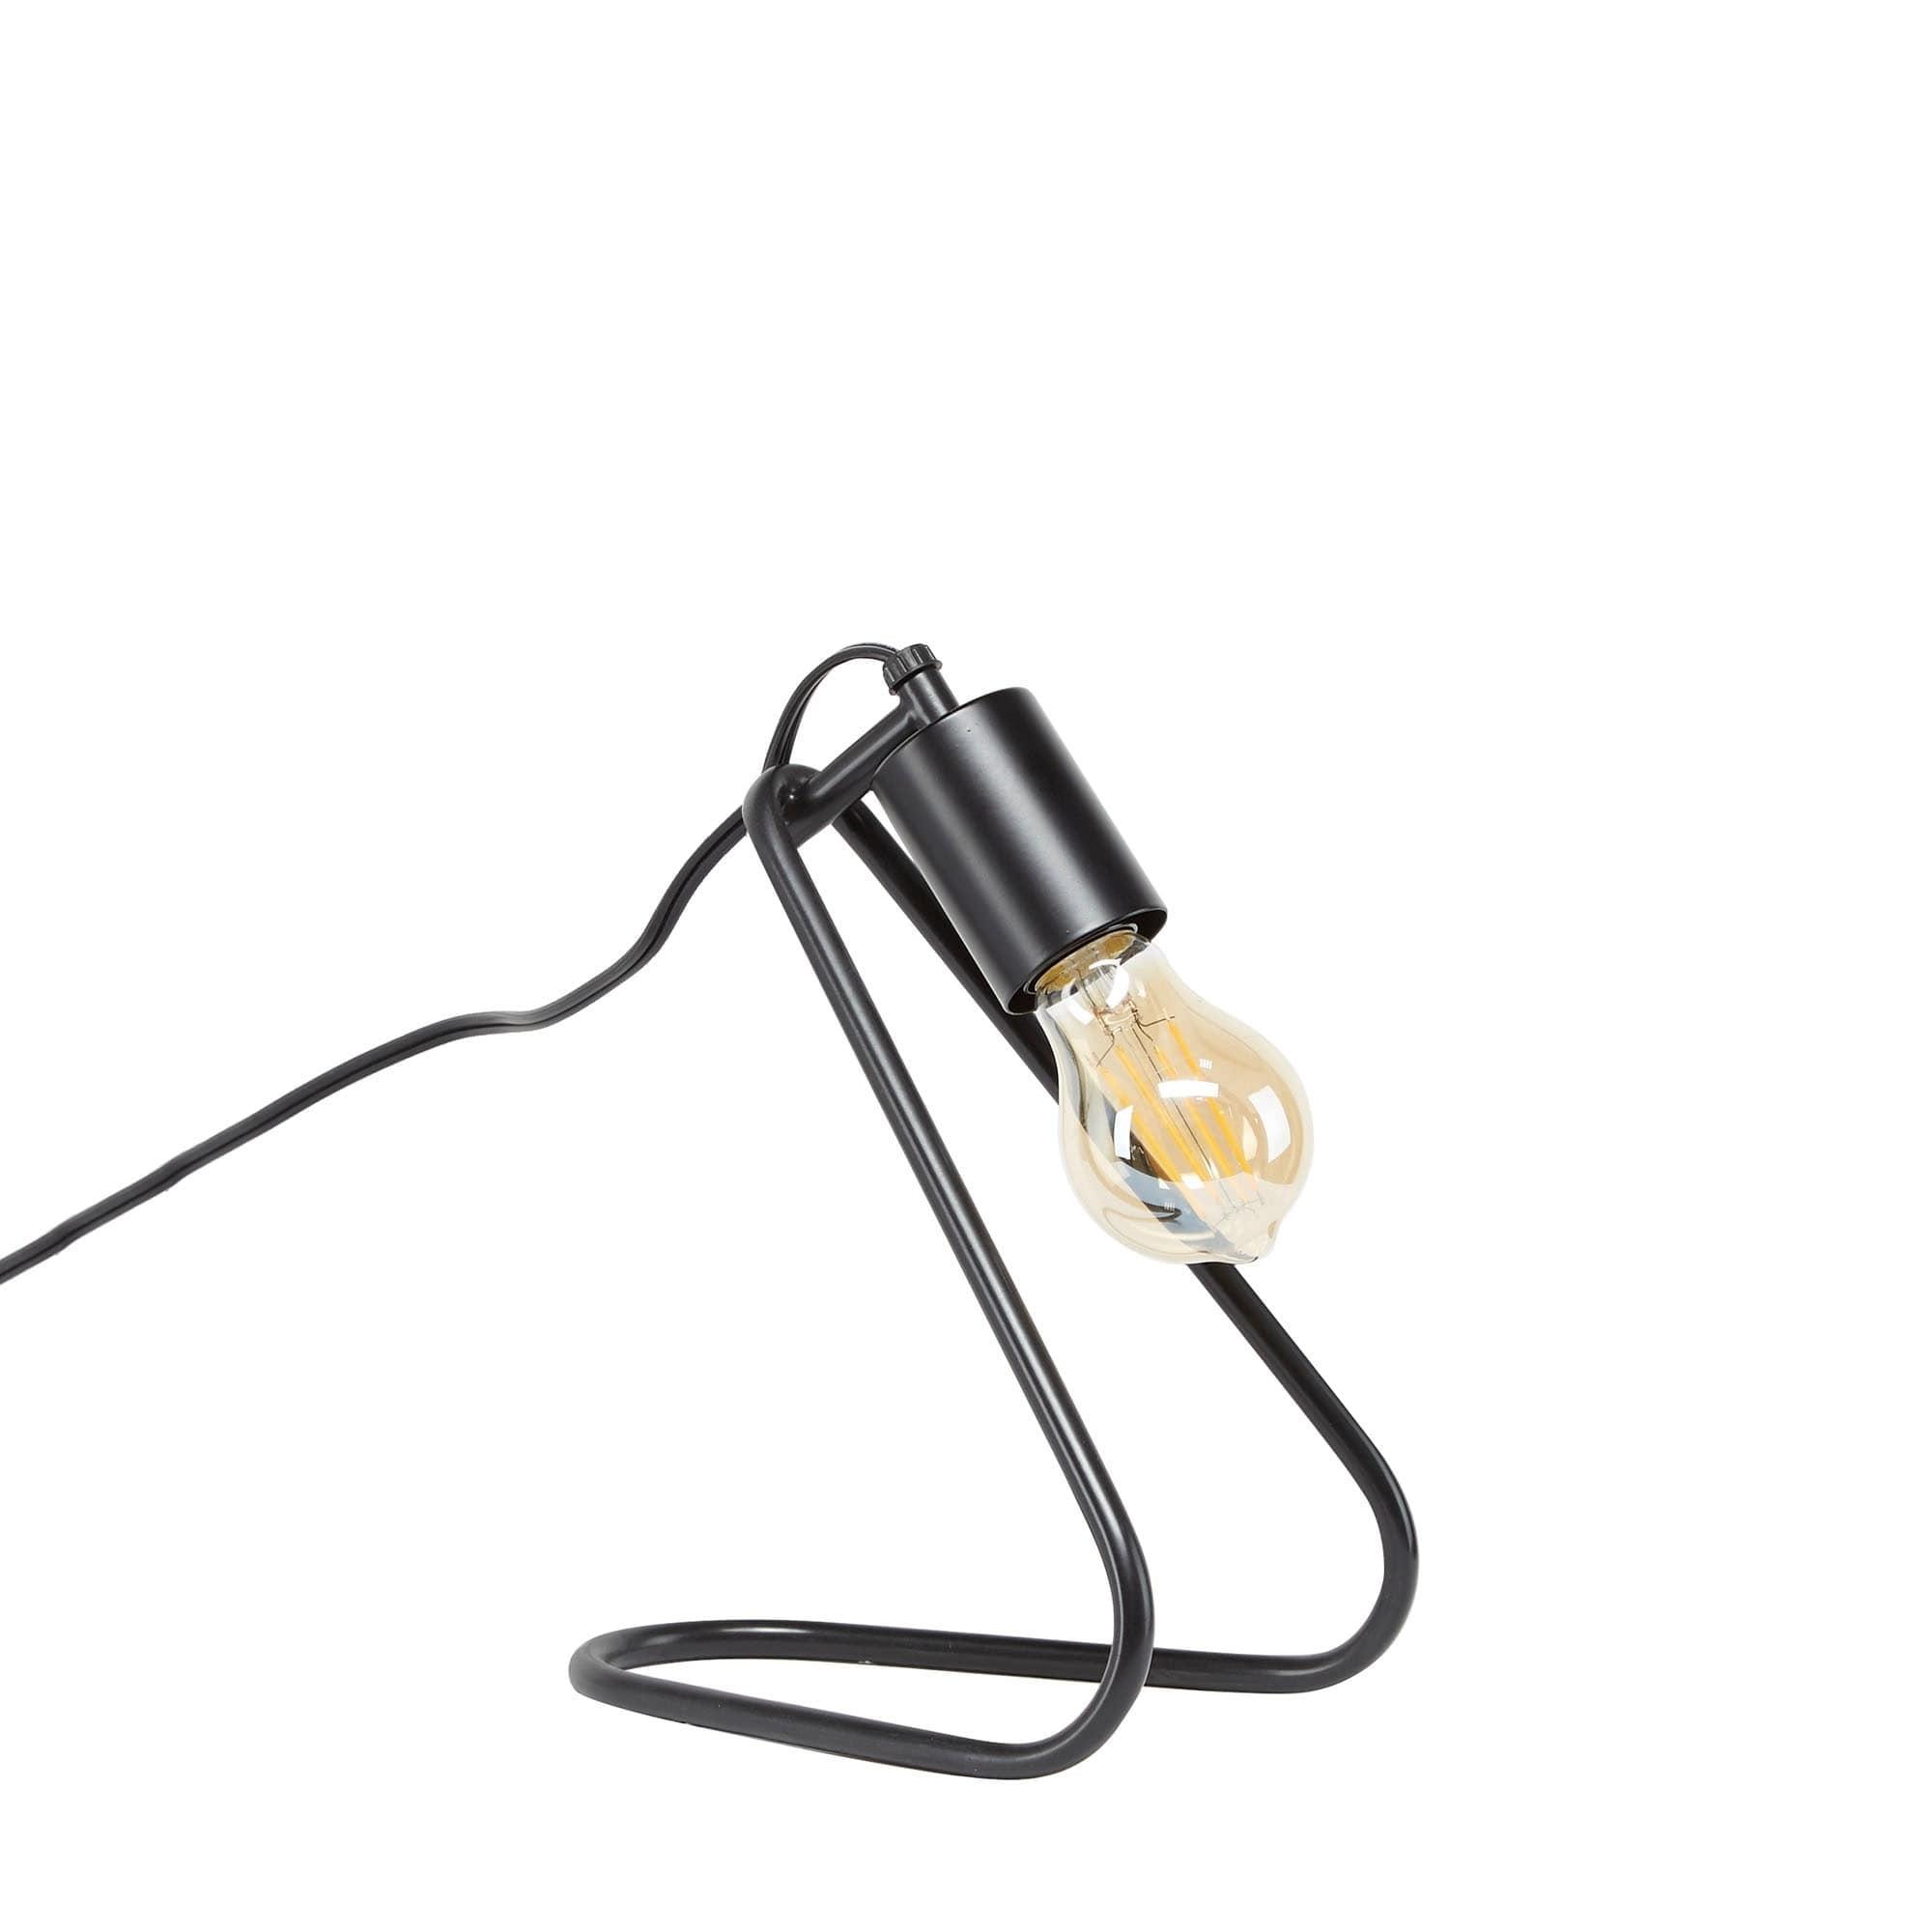 Shuyler Exposed Bulb Angeled Table Lamp